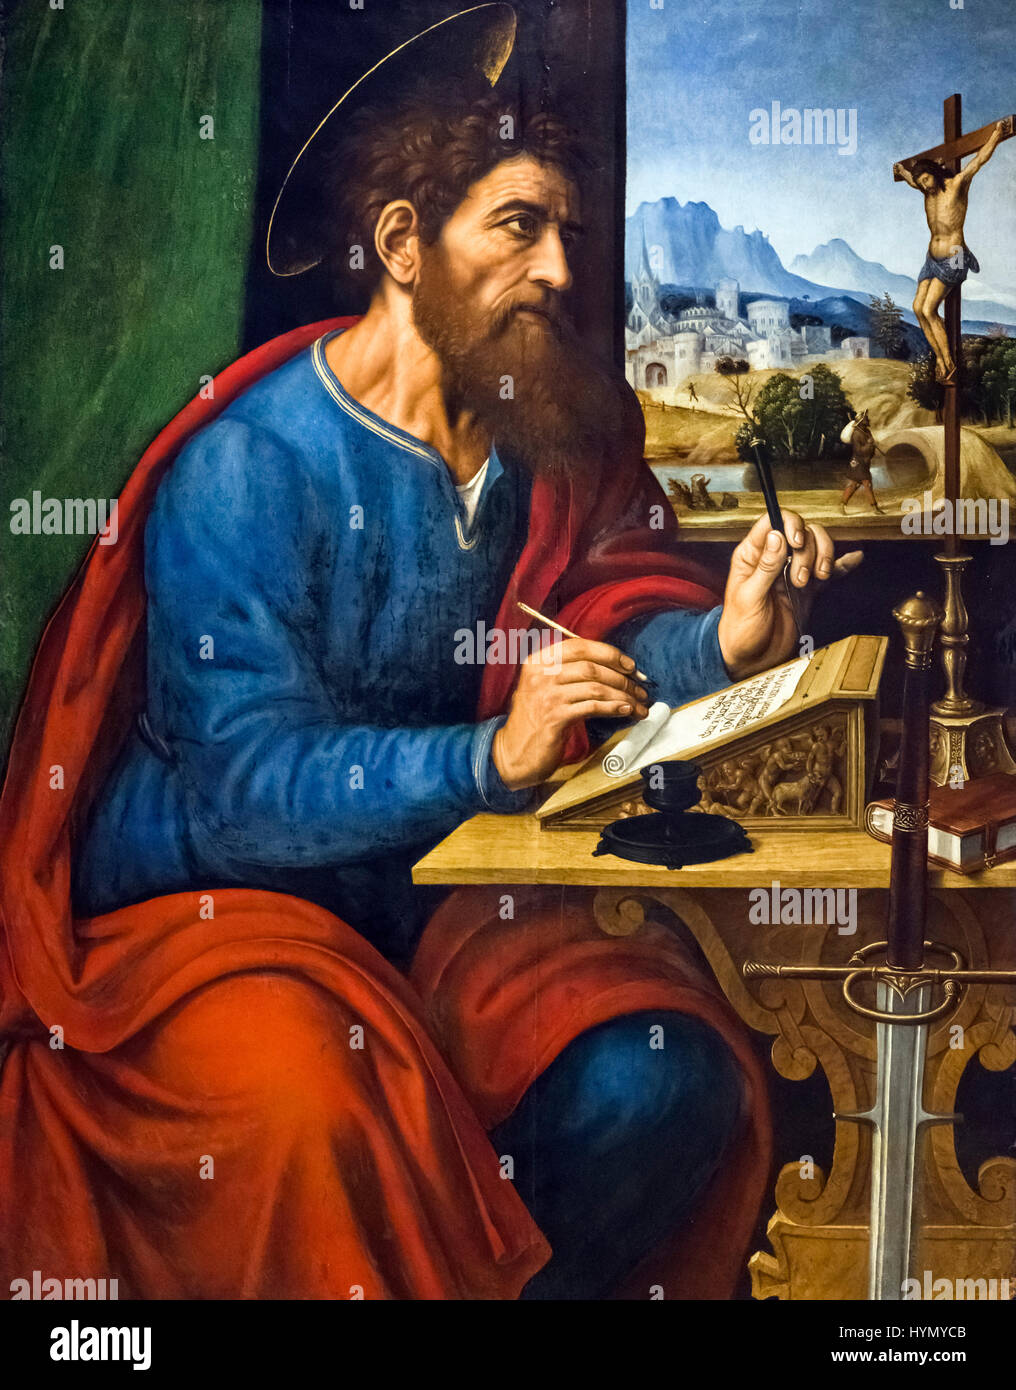 Saint Paul Writing by Pier Francesco Sacchi (1485-1528), oil on poplar, 1520s - Stock Image